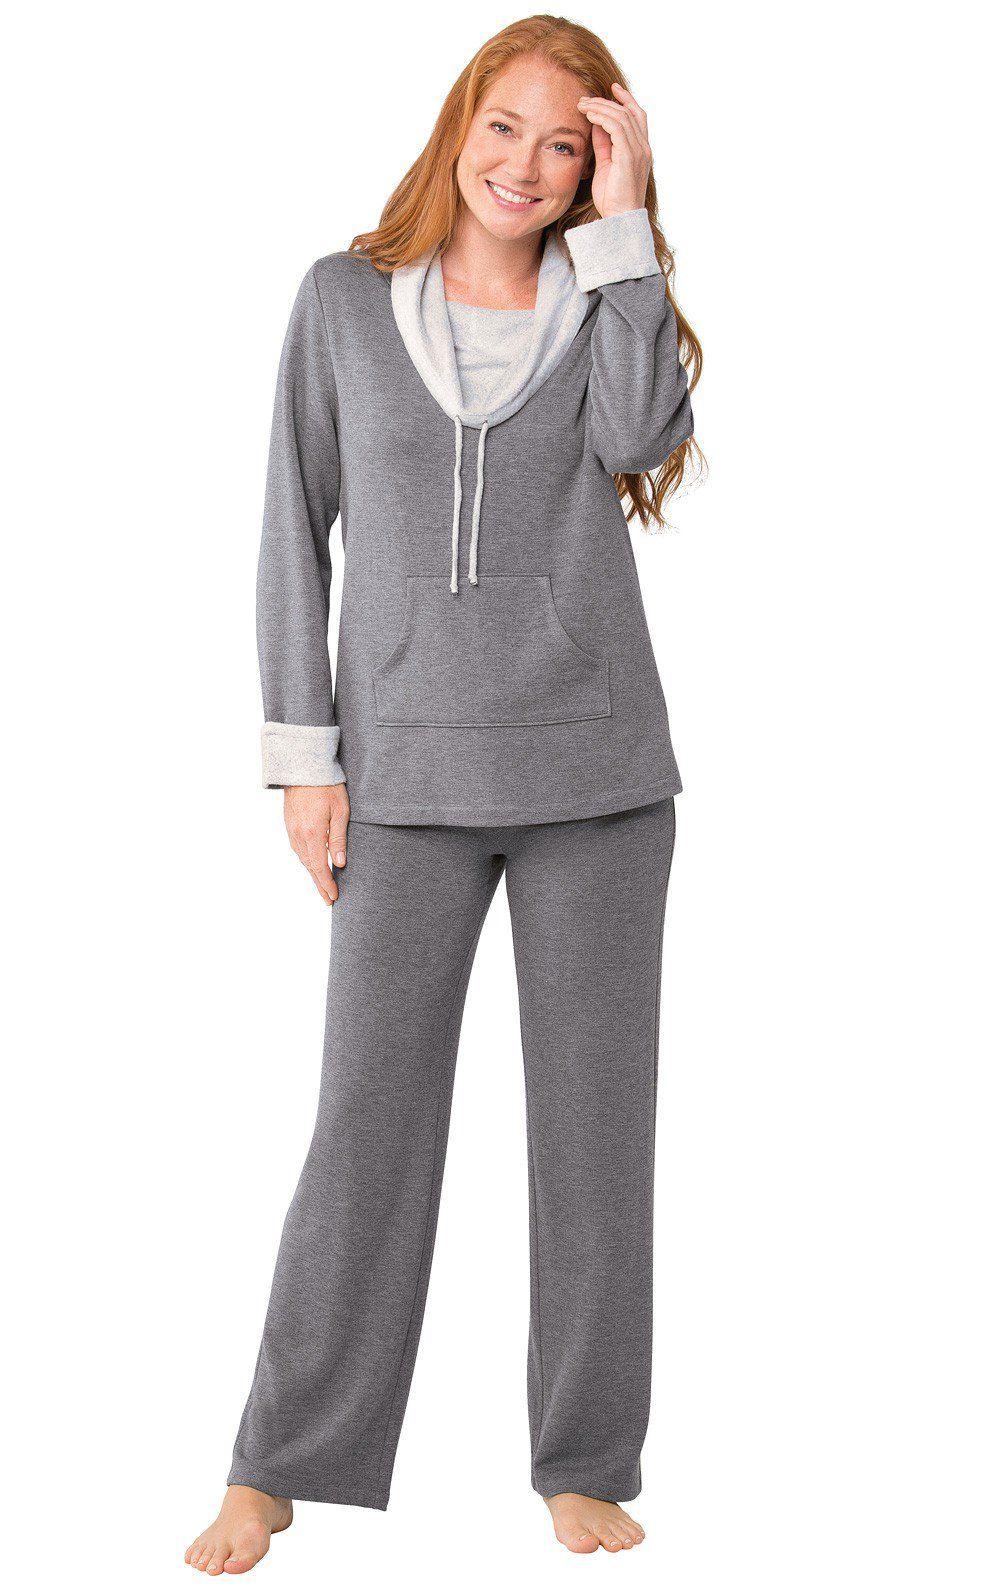 World s Softest Pajamas - Charcoal  b1cdaea9d